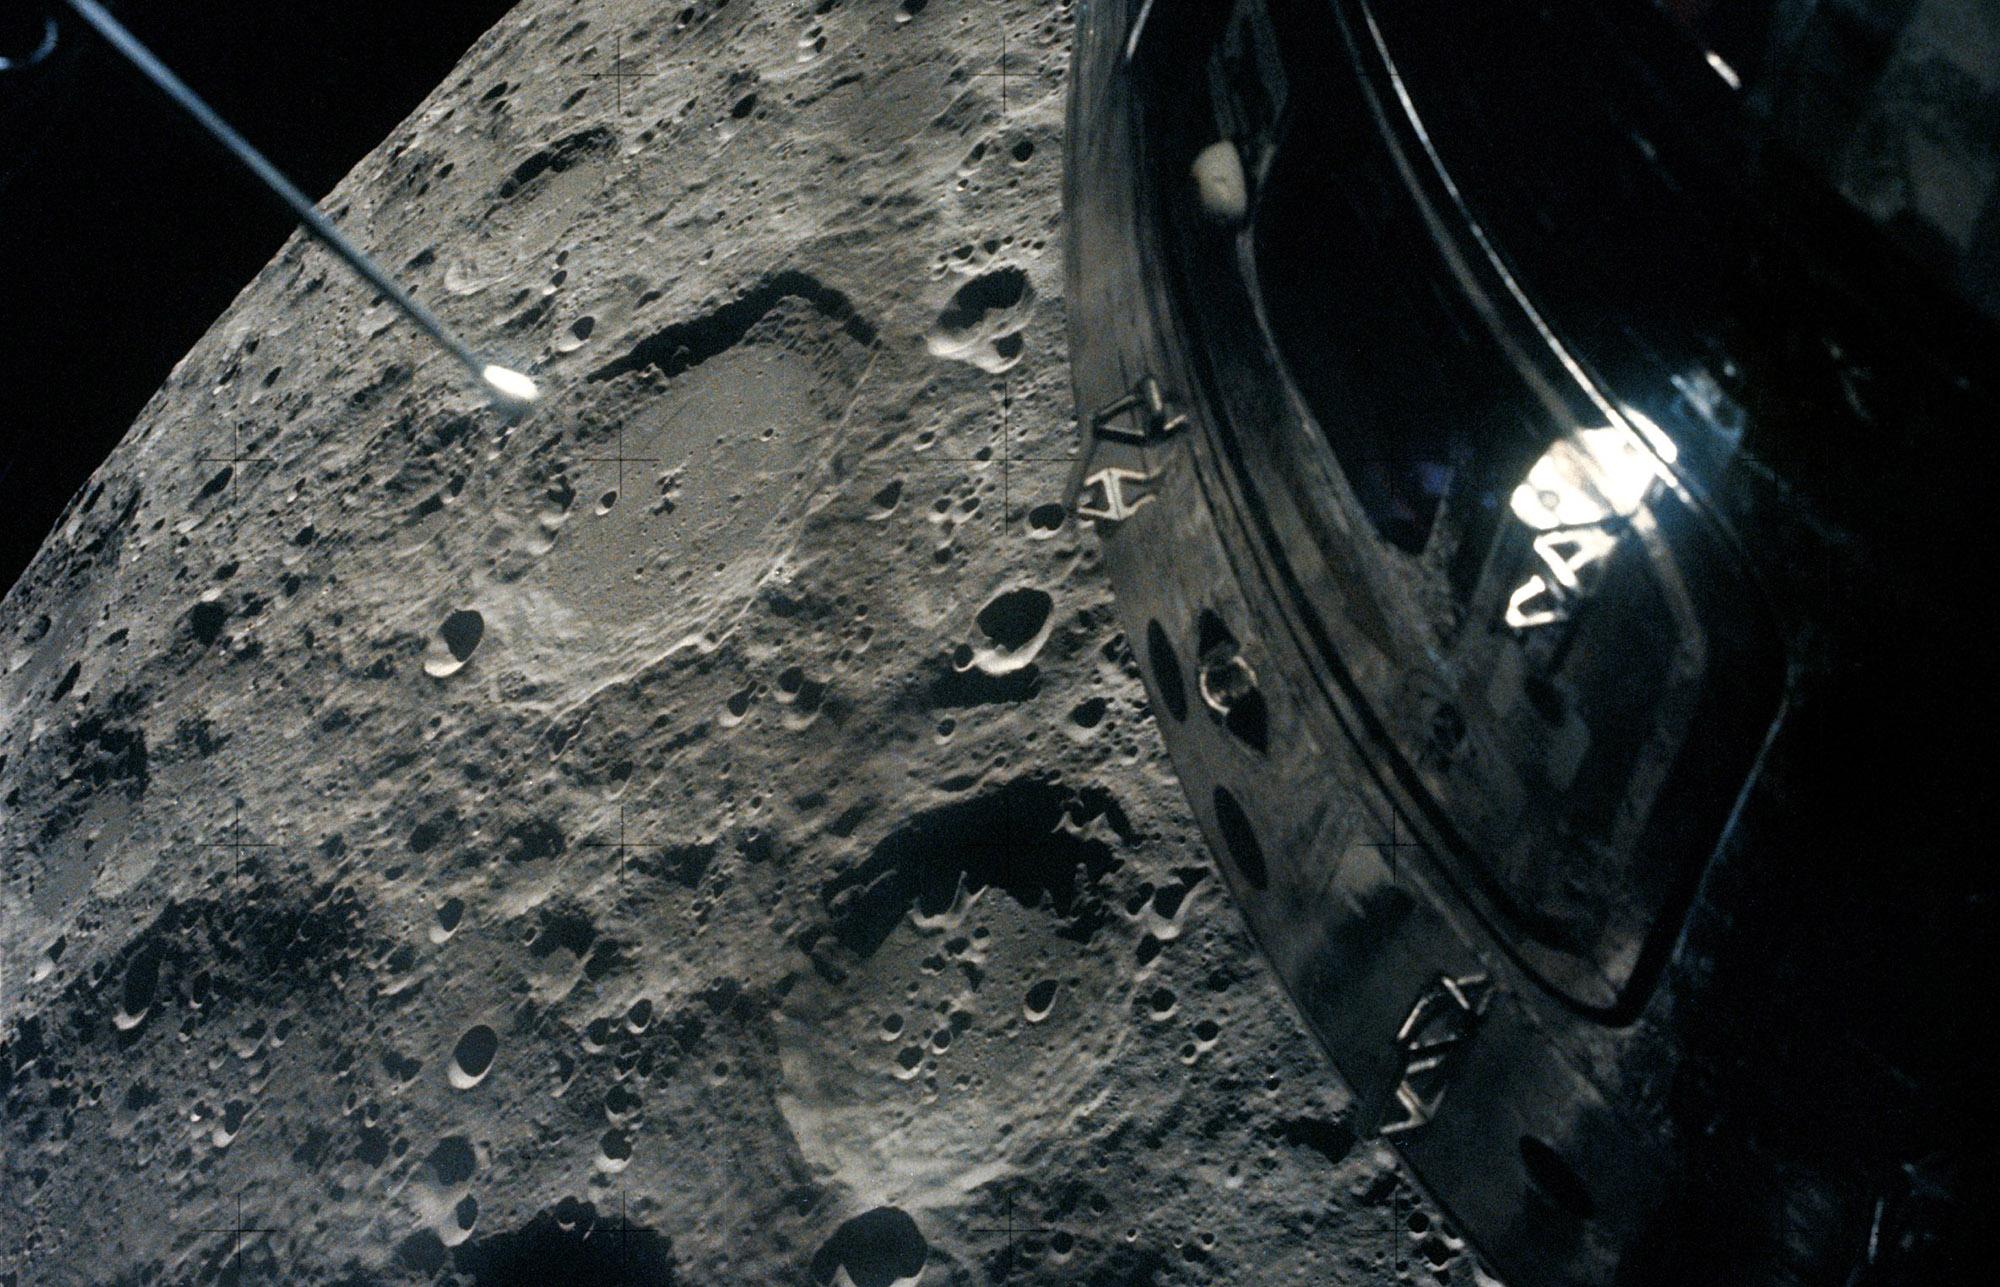 NASA marking the 50th anniversary of